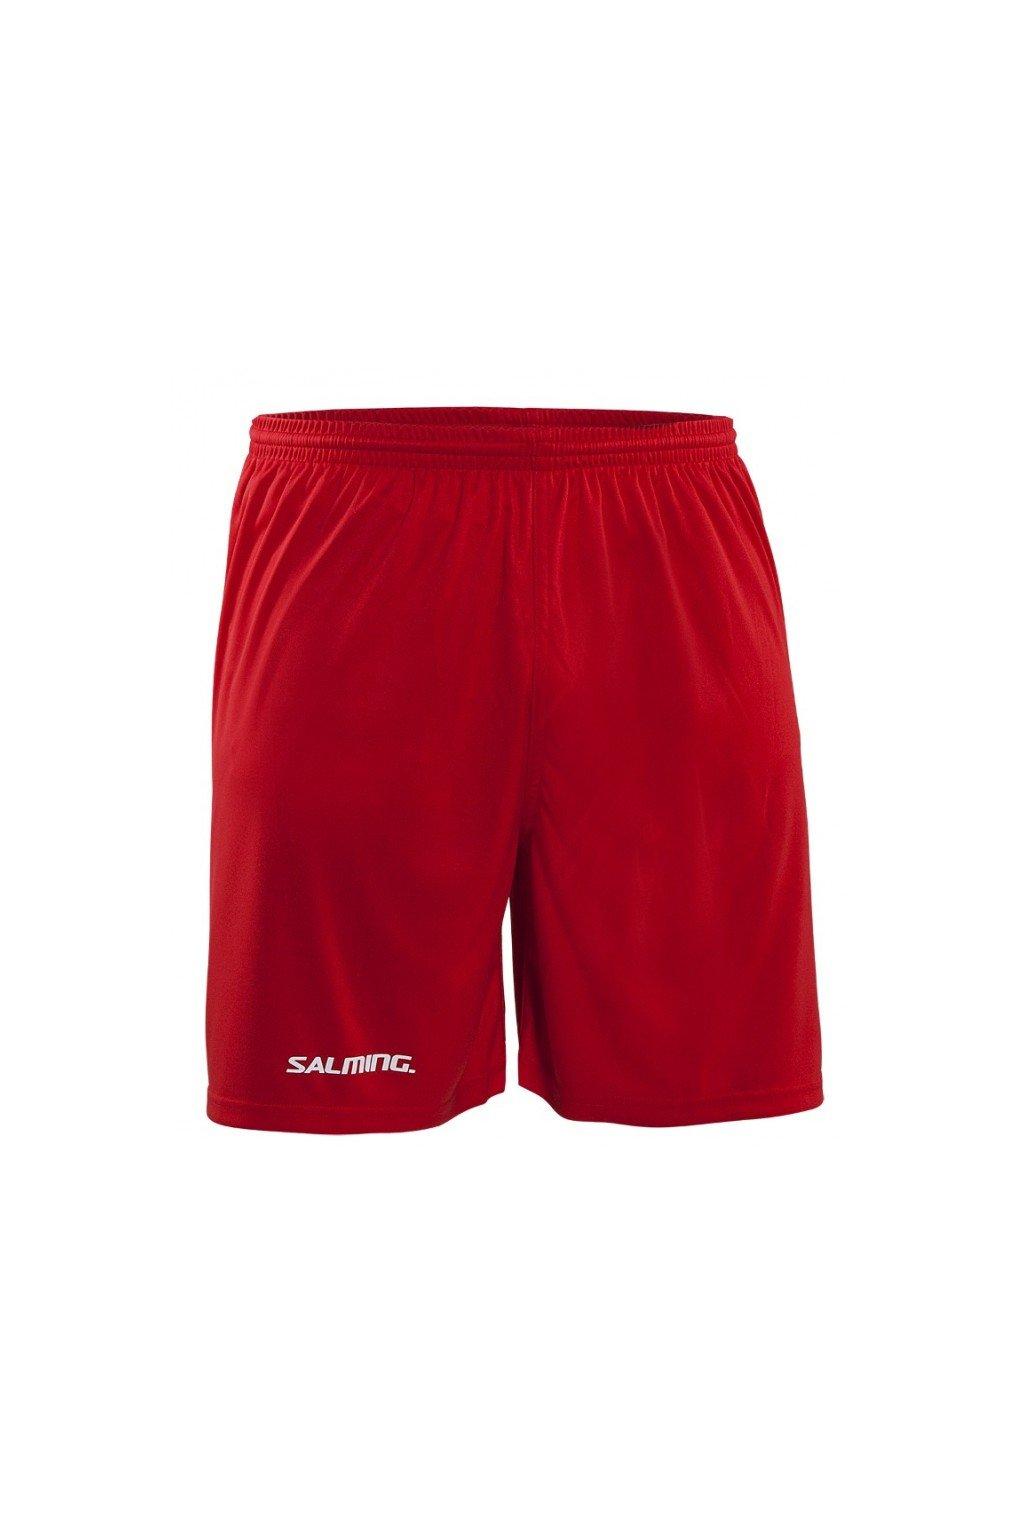 salming core shorts sr red xxxl